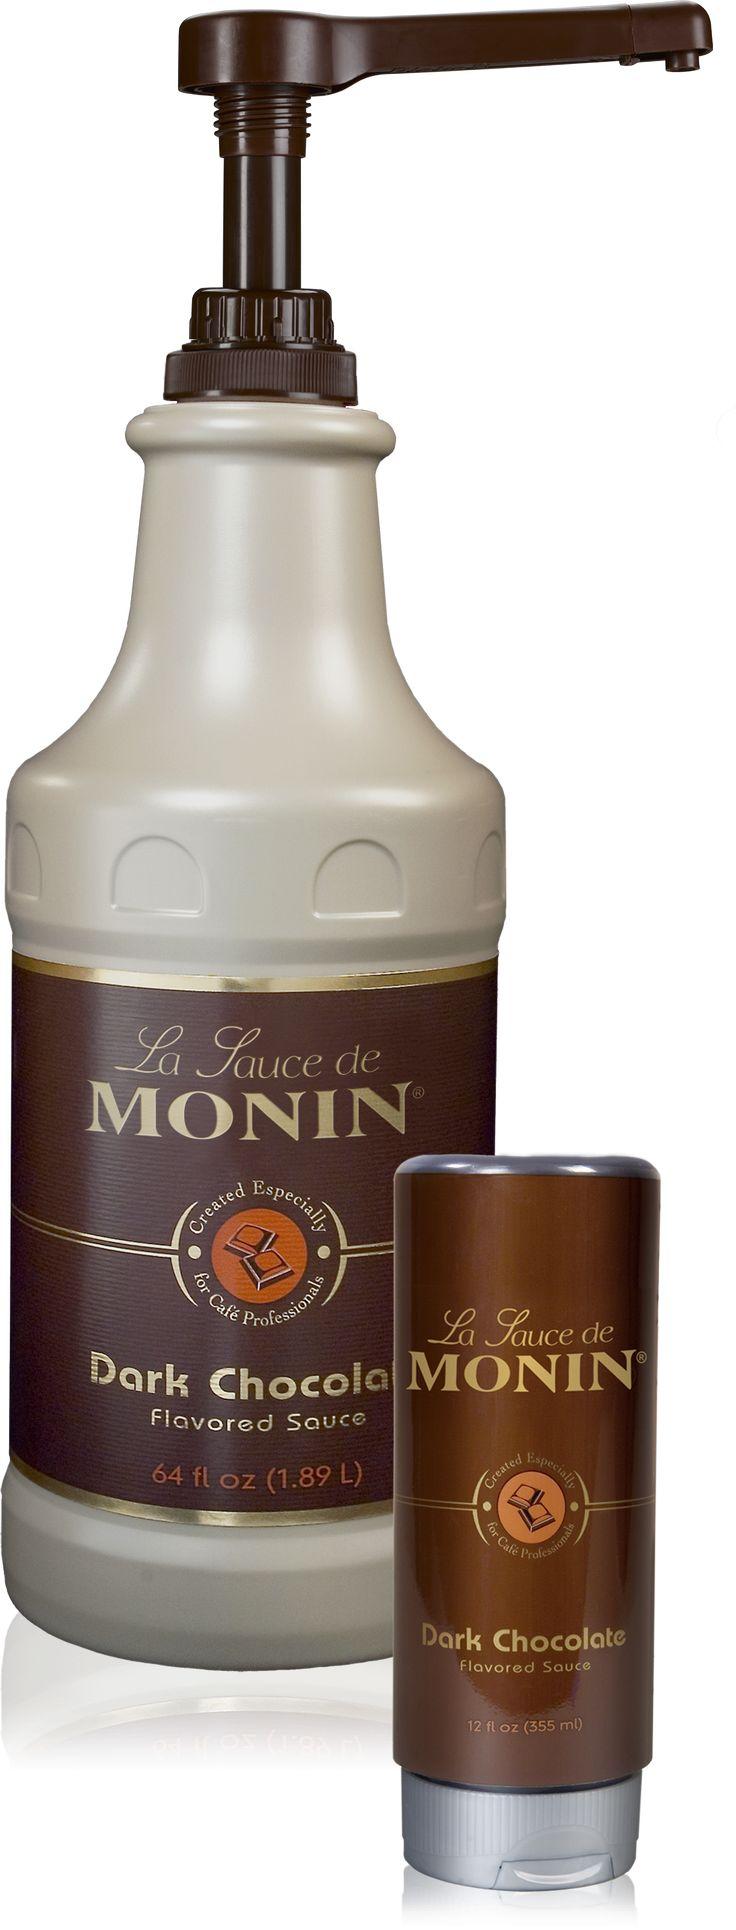 Dark Chocolate Sauce  -  Gourmet Sauces  -  Products  - Monin